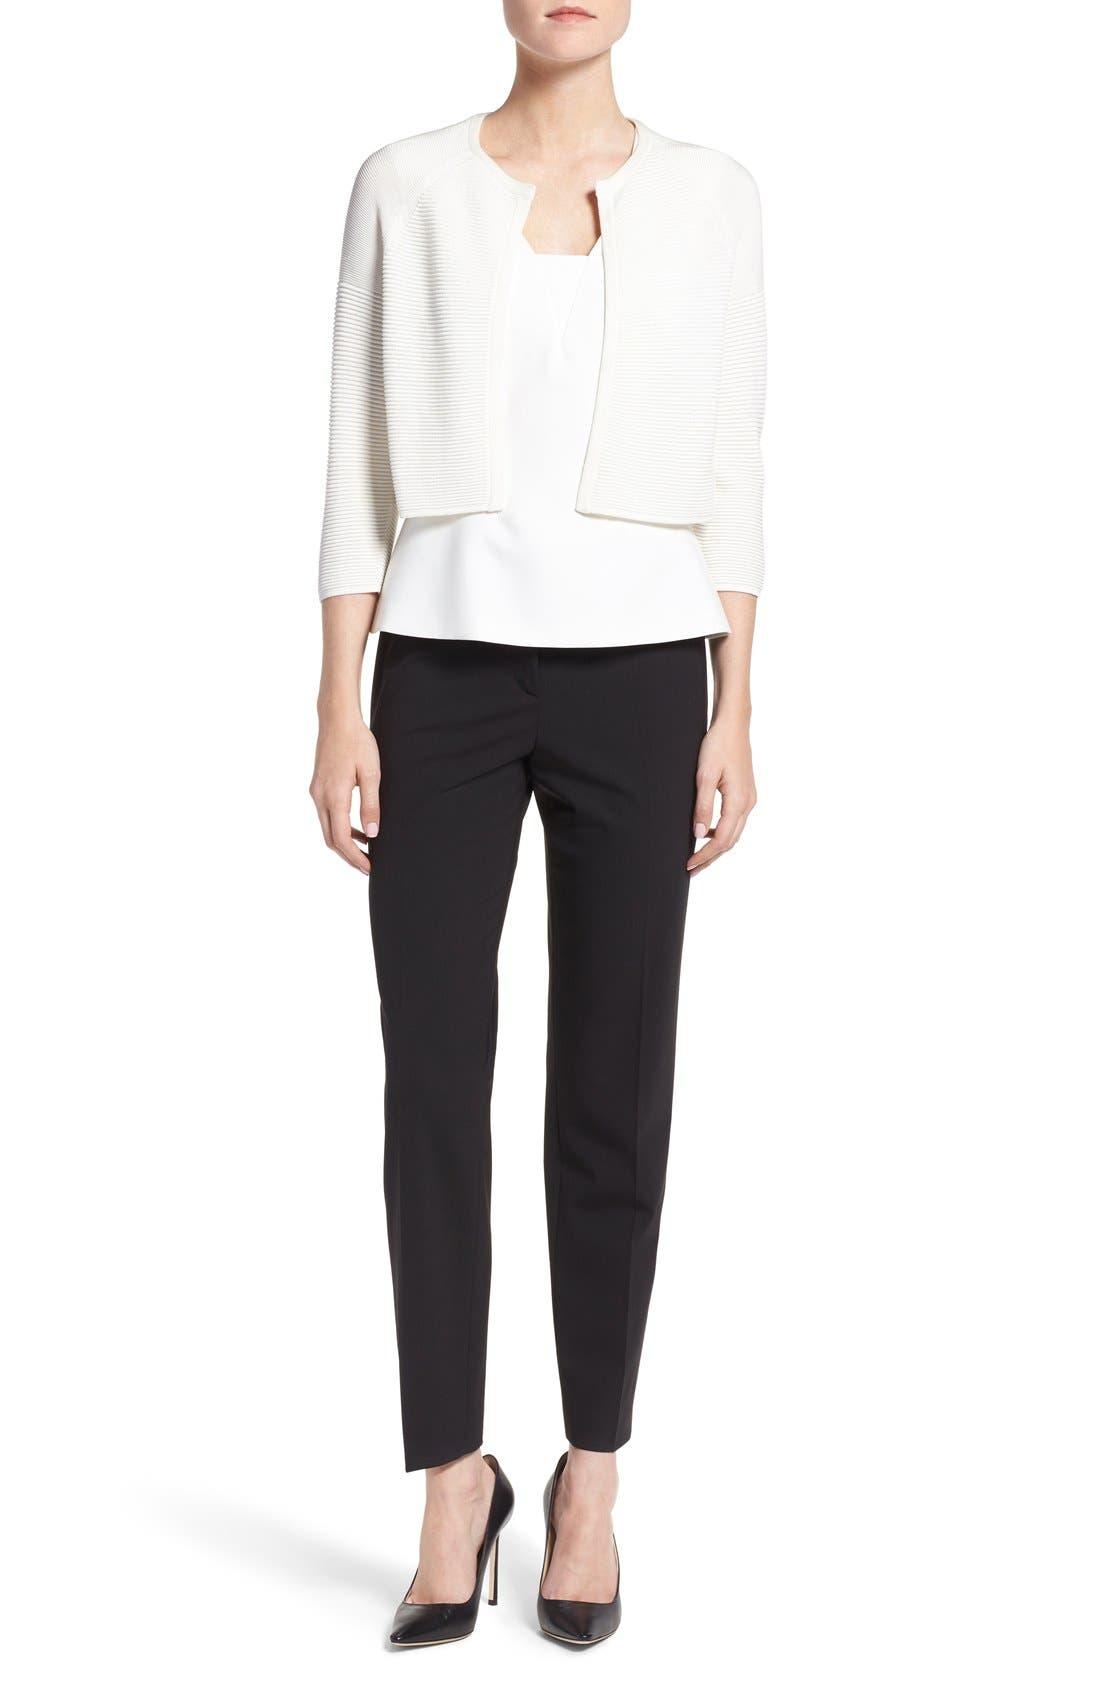 Tiluna Tropical Stretch Wool Ankle Trousers,                             Alternate thumbnail 7, color,                             BLACK